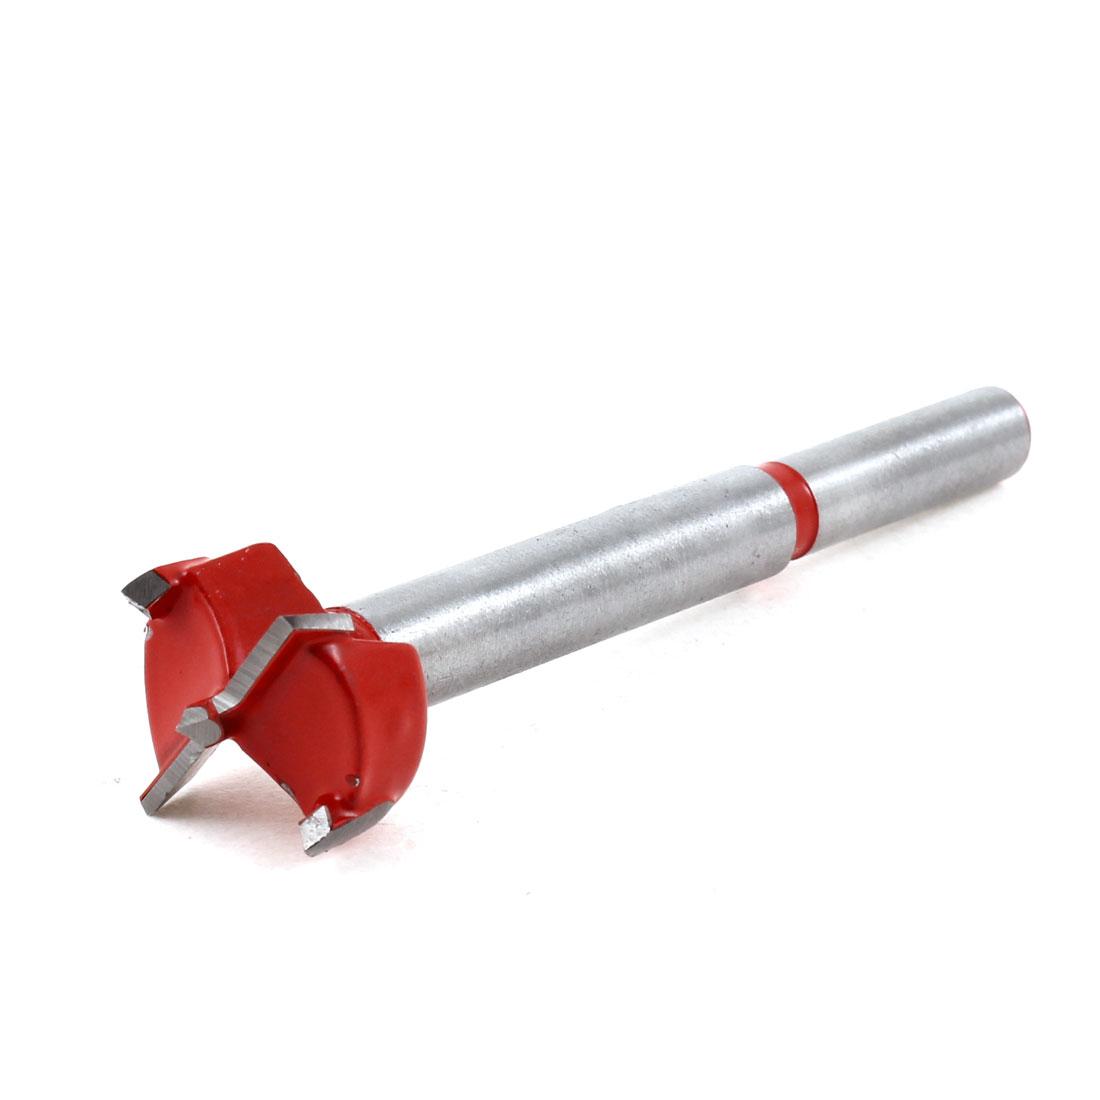 Carpenters Carbide Tipped 20mm Diameter Hinge Boring Bit Red Silver Tone